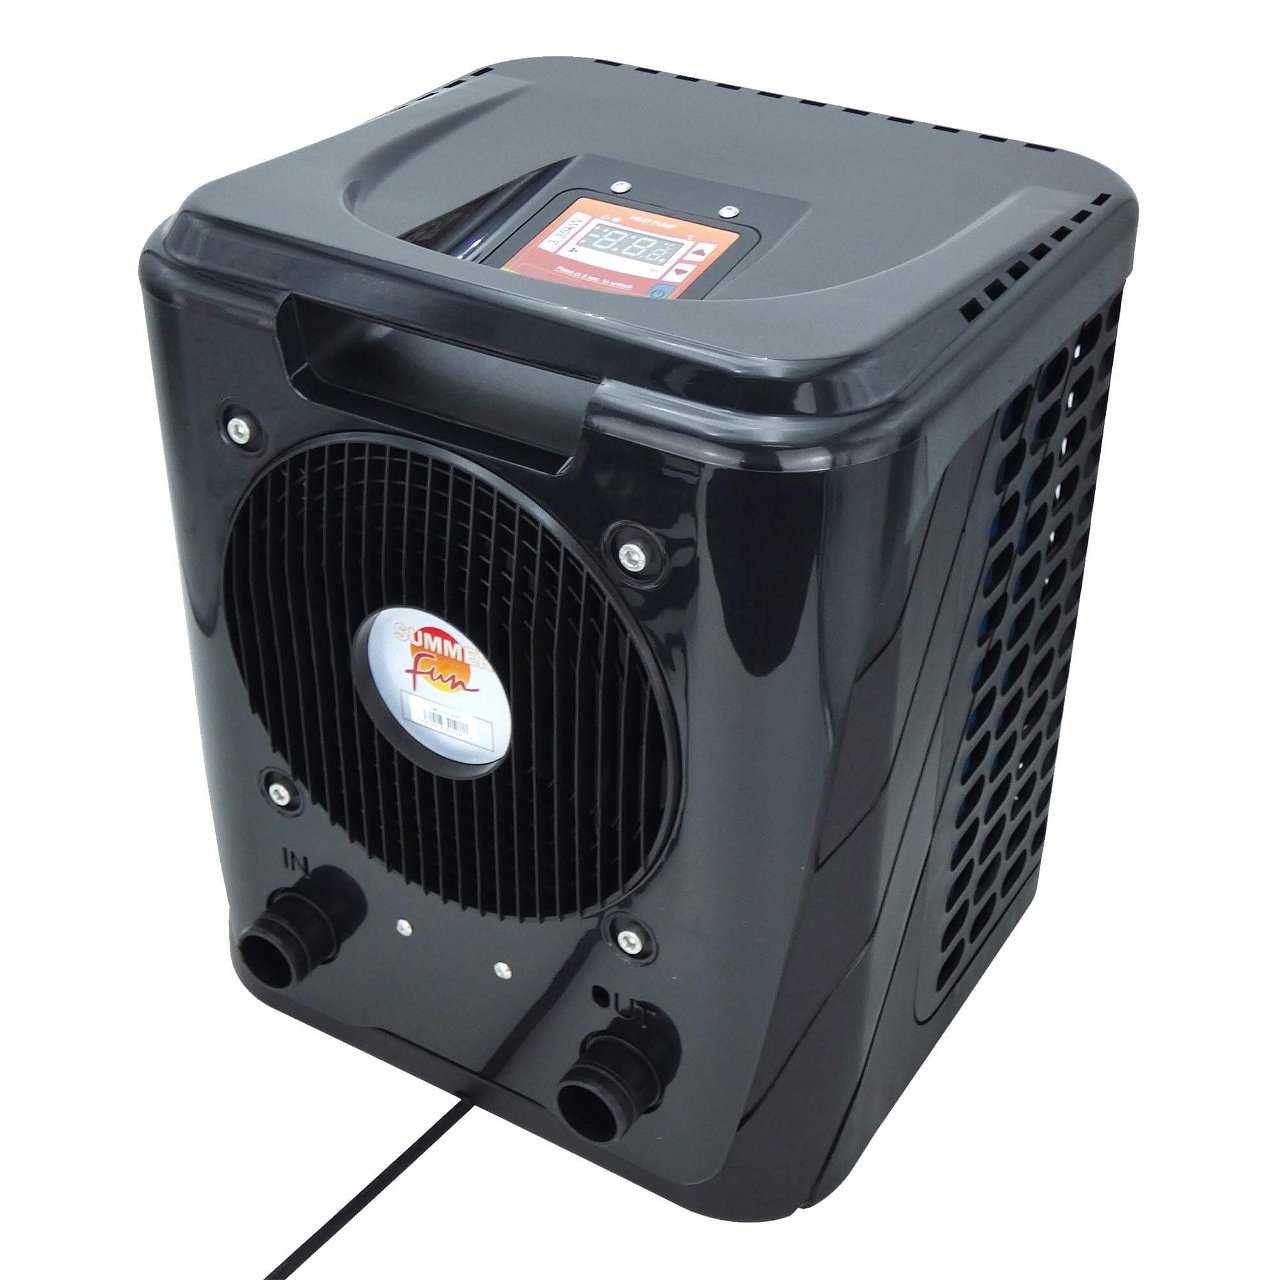 Summer Fun Wärmepumpe Smart 3,35 kW